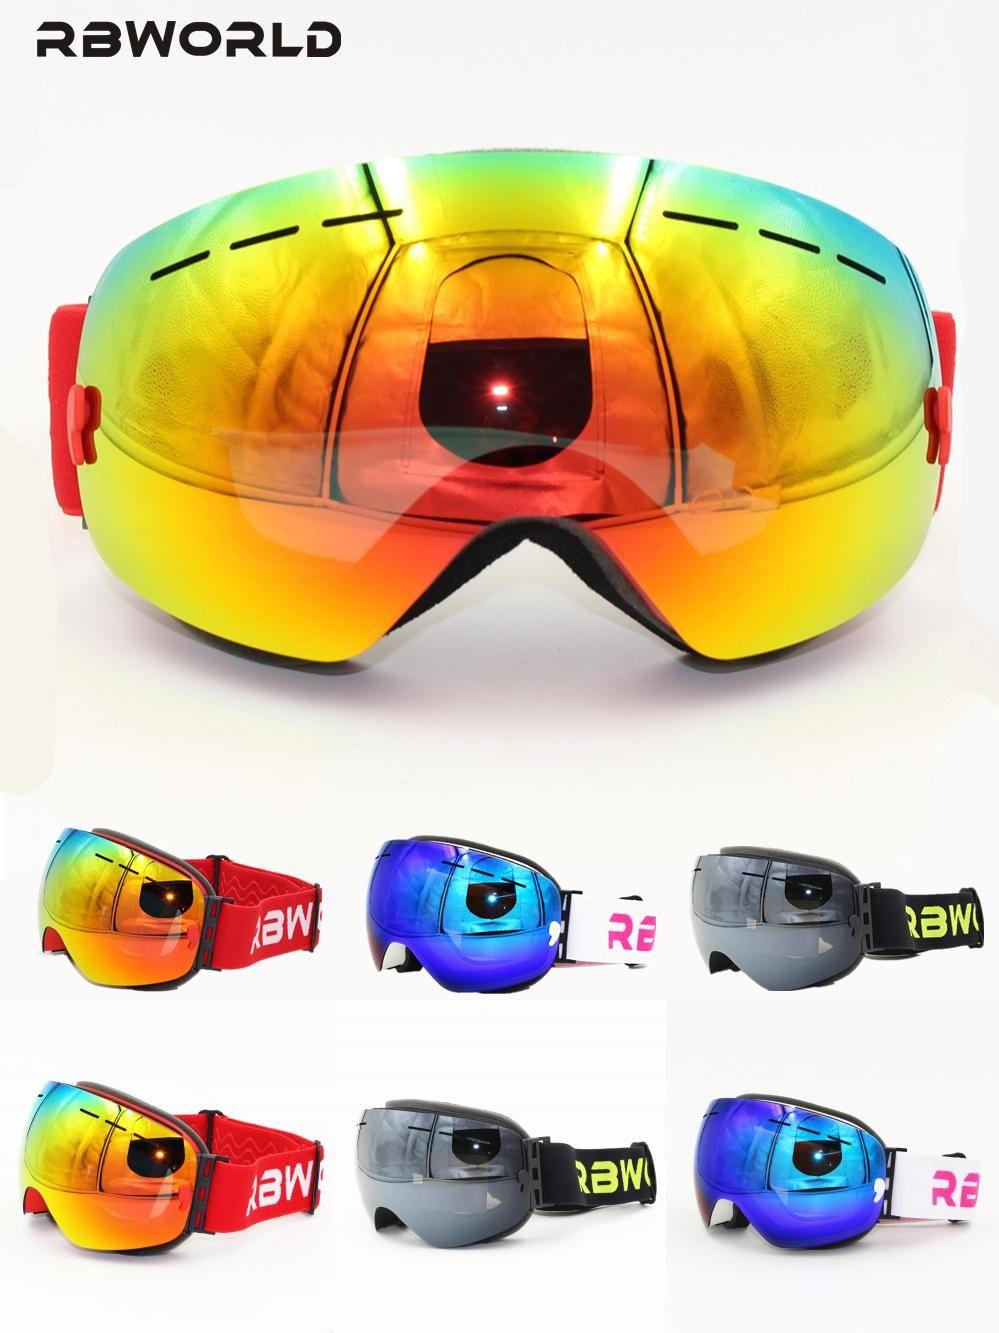 c4a59ca47184  Visit to Buy  New RBWORLD brand ski goggles double layers UV400 anti-fog